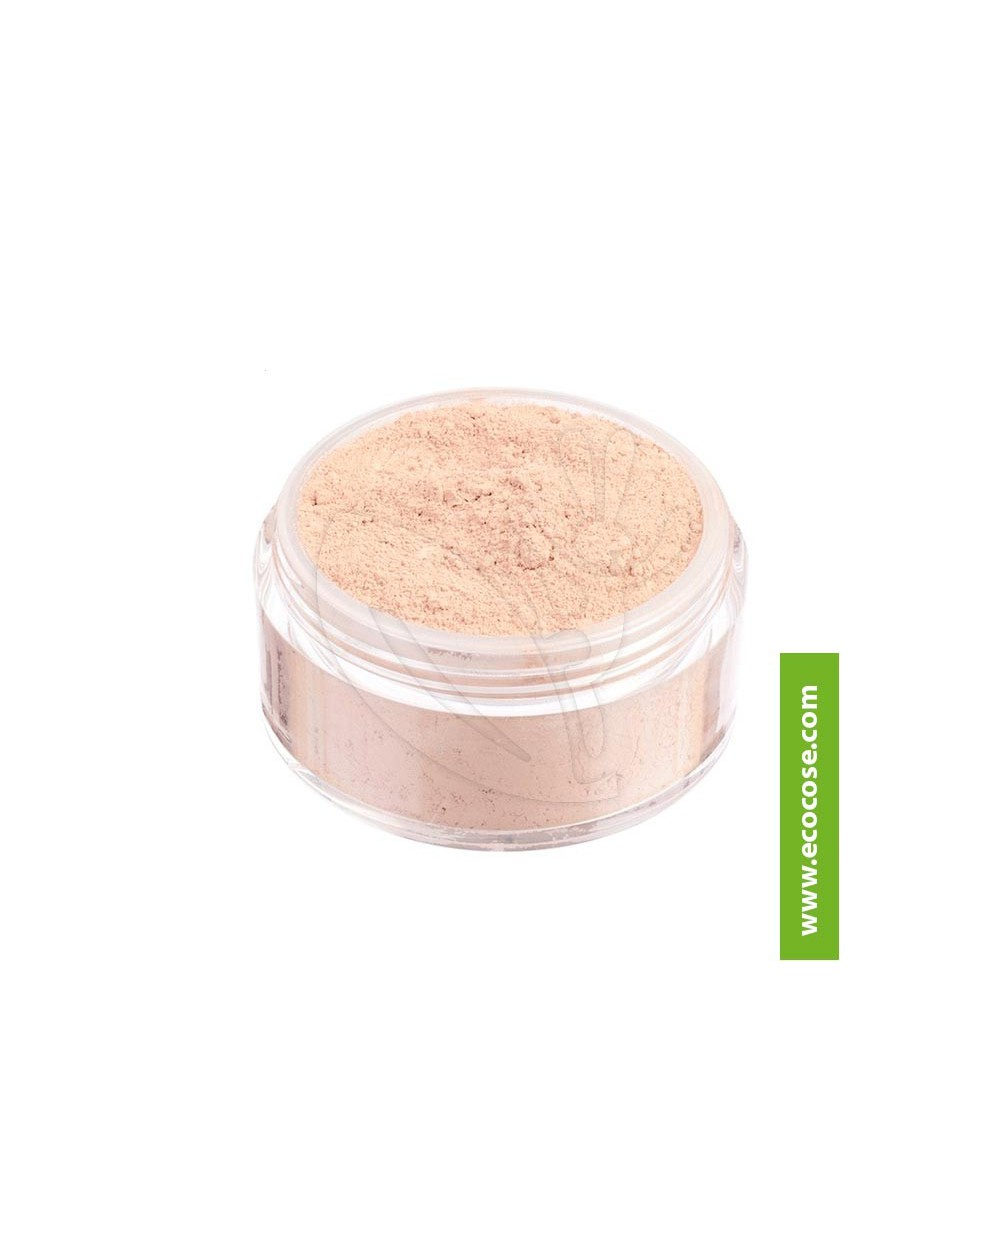 "Neve Cosmetics - Fondotinta Minerale ""Fair Neutral"" High Coverage"